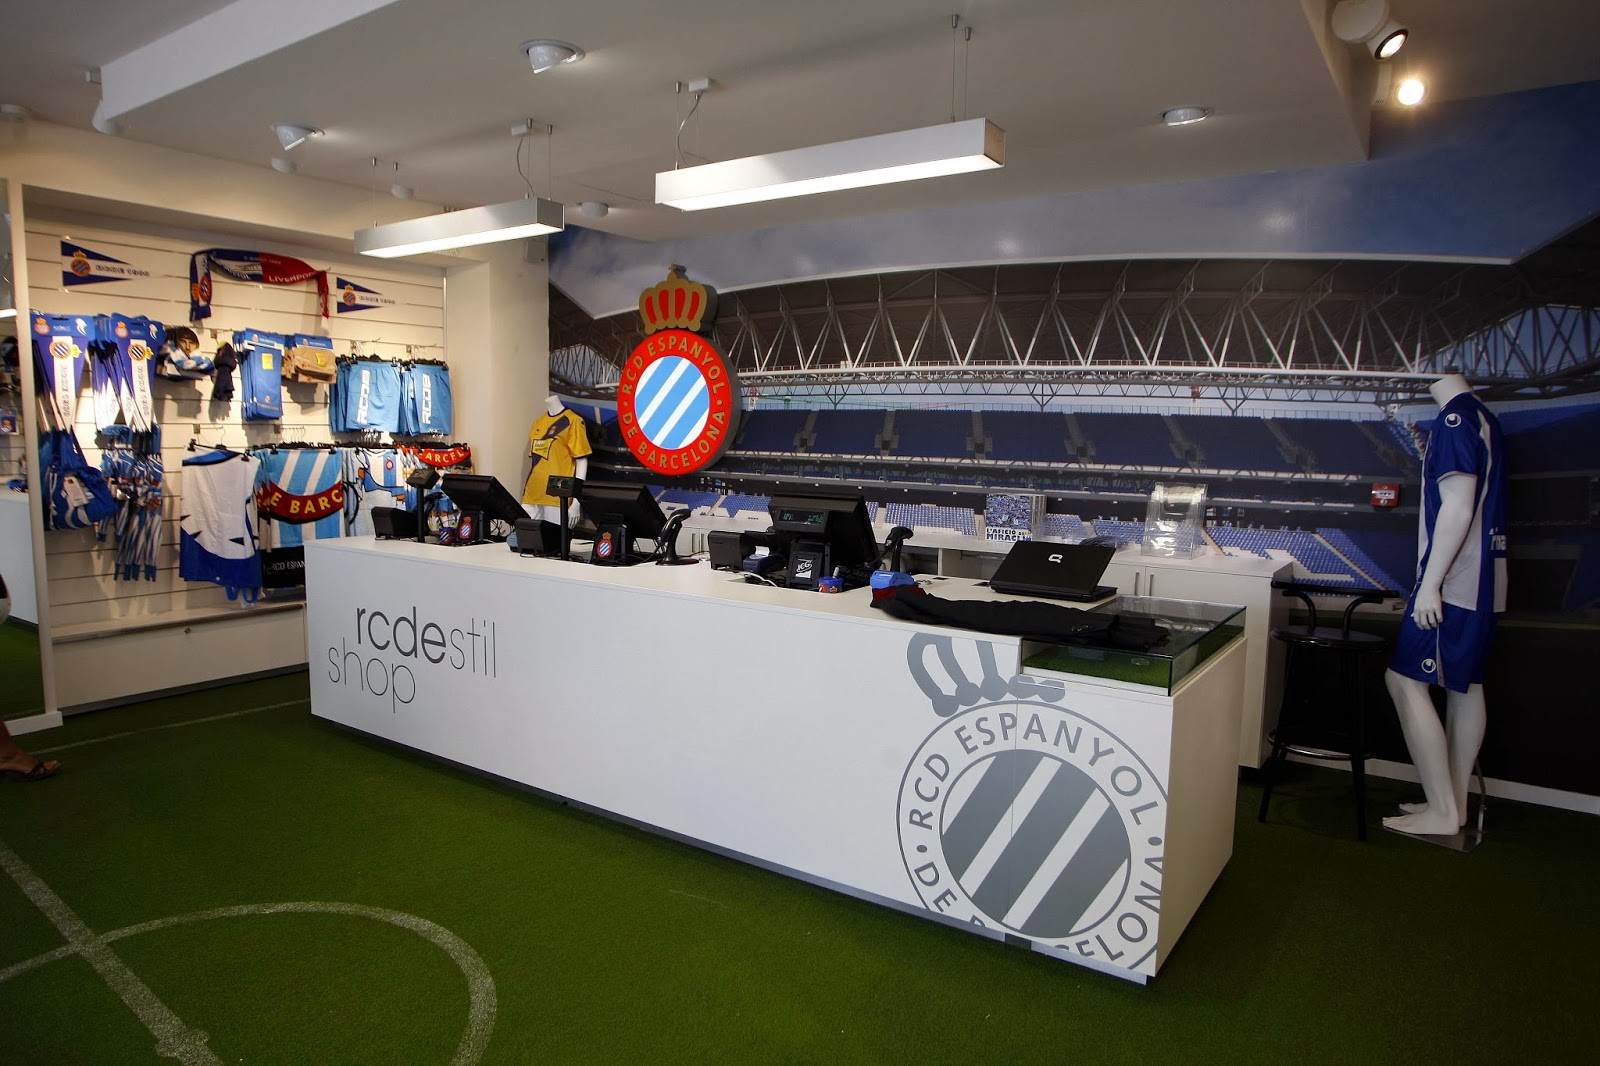 Tienda de RCD-Espanyol - ligamxshop.com